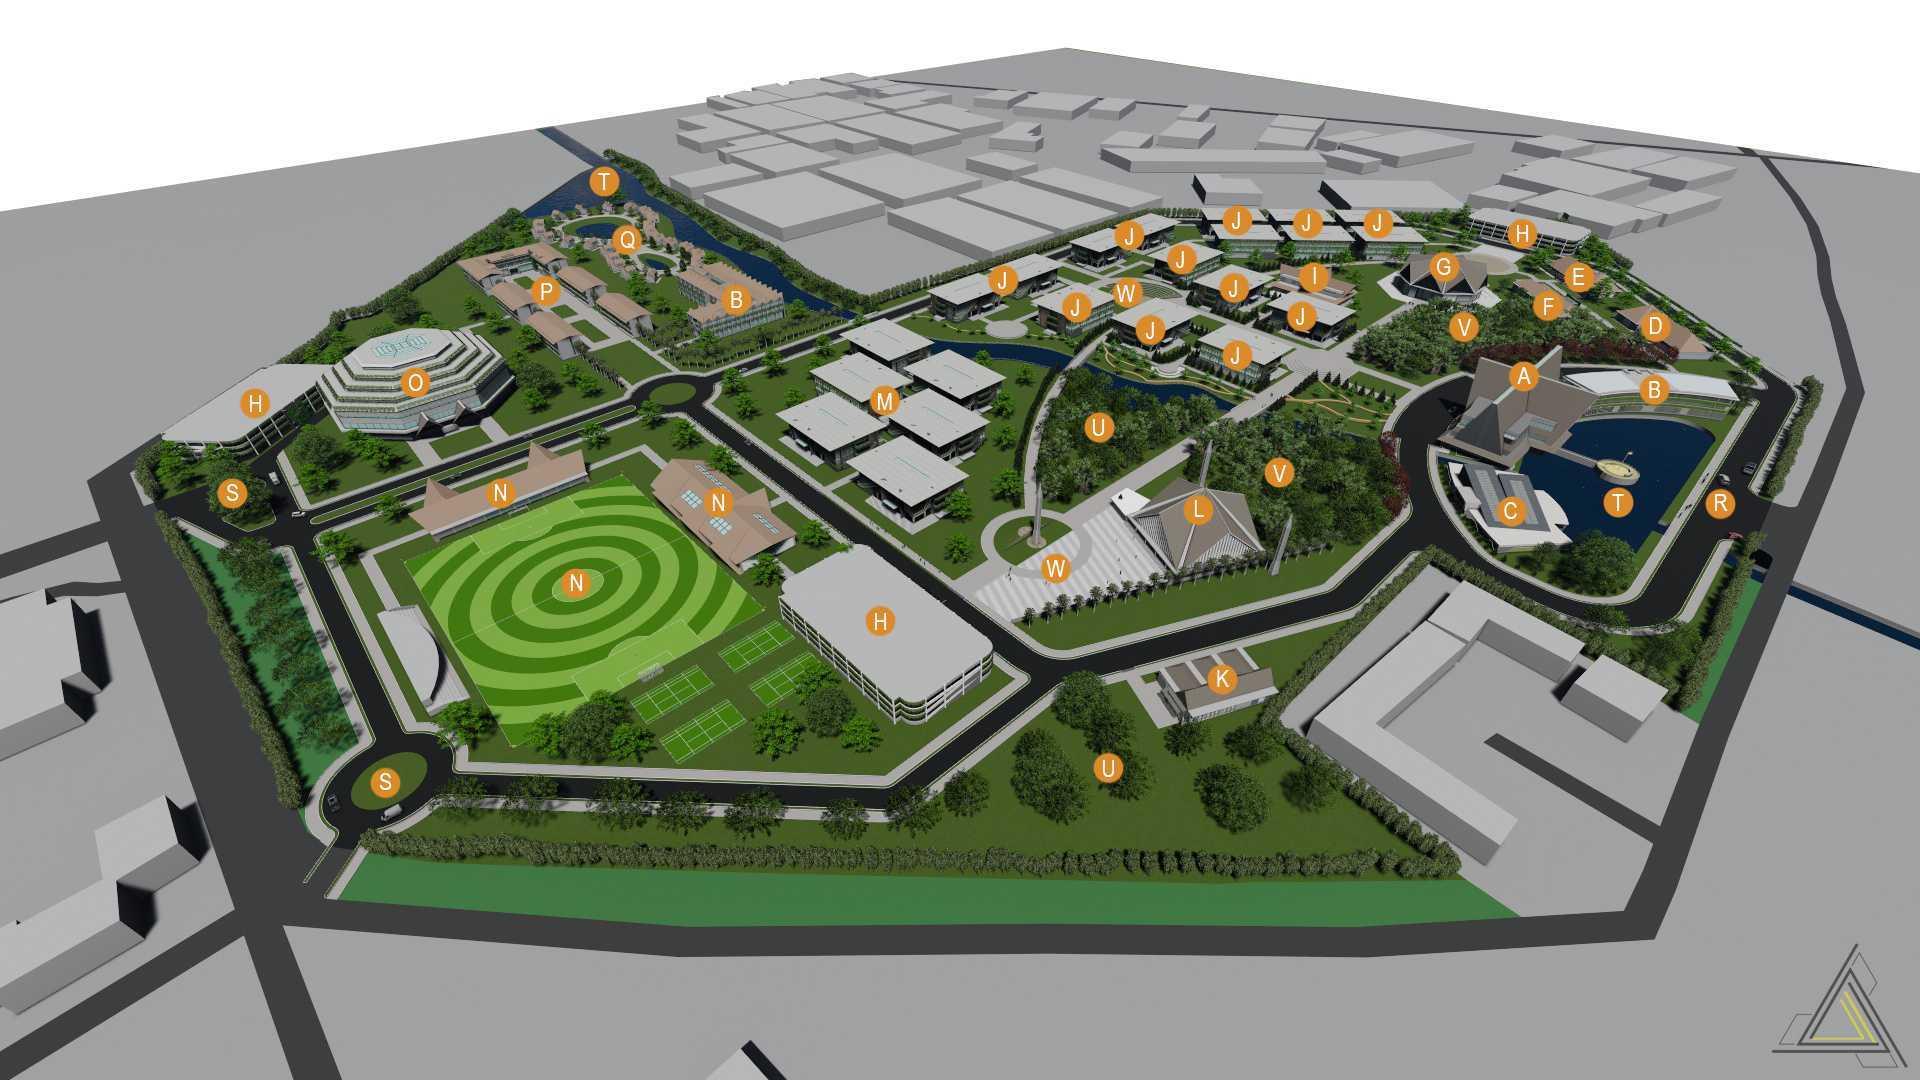 Dap Studio Sekolah Tinggi Pariwisata Bandung Bandung Bandung Masterplan   21025